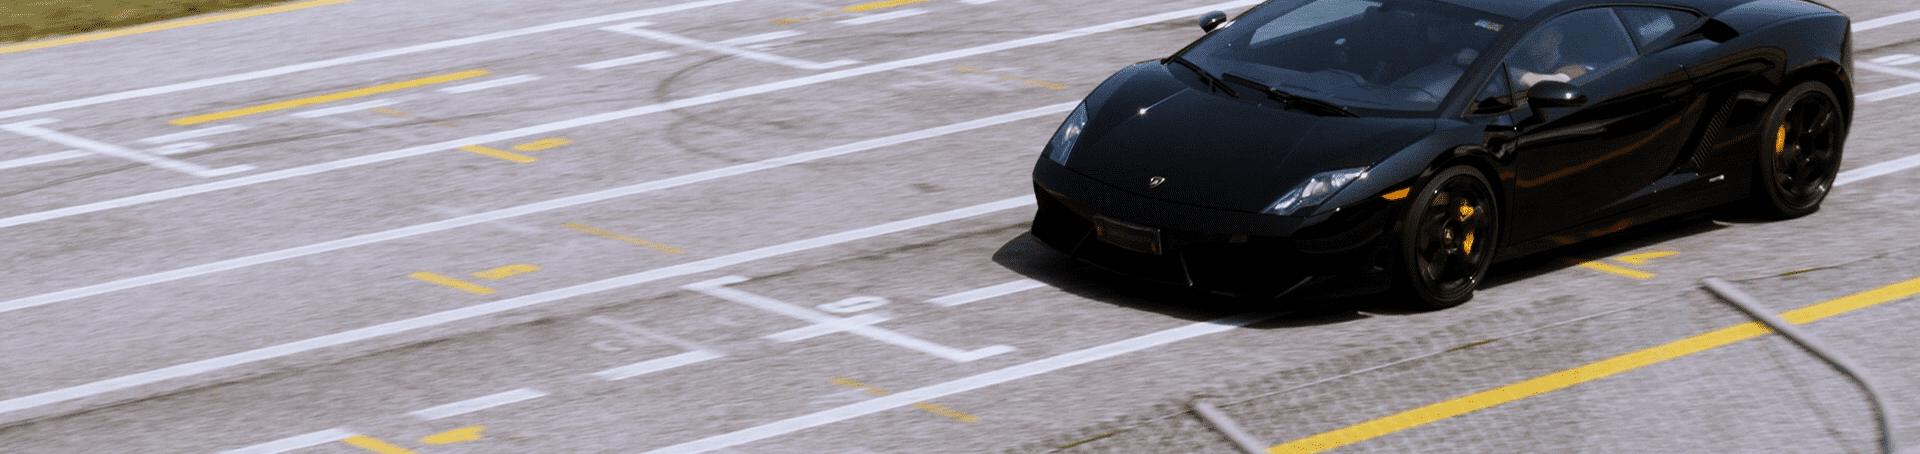 Ein Schwarzer Lamborghini Gallardo von Carschoolbox in Italien